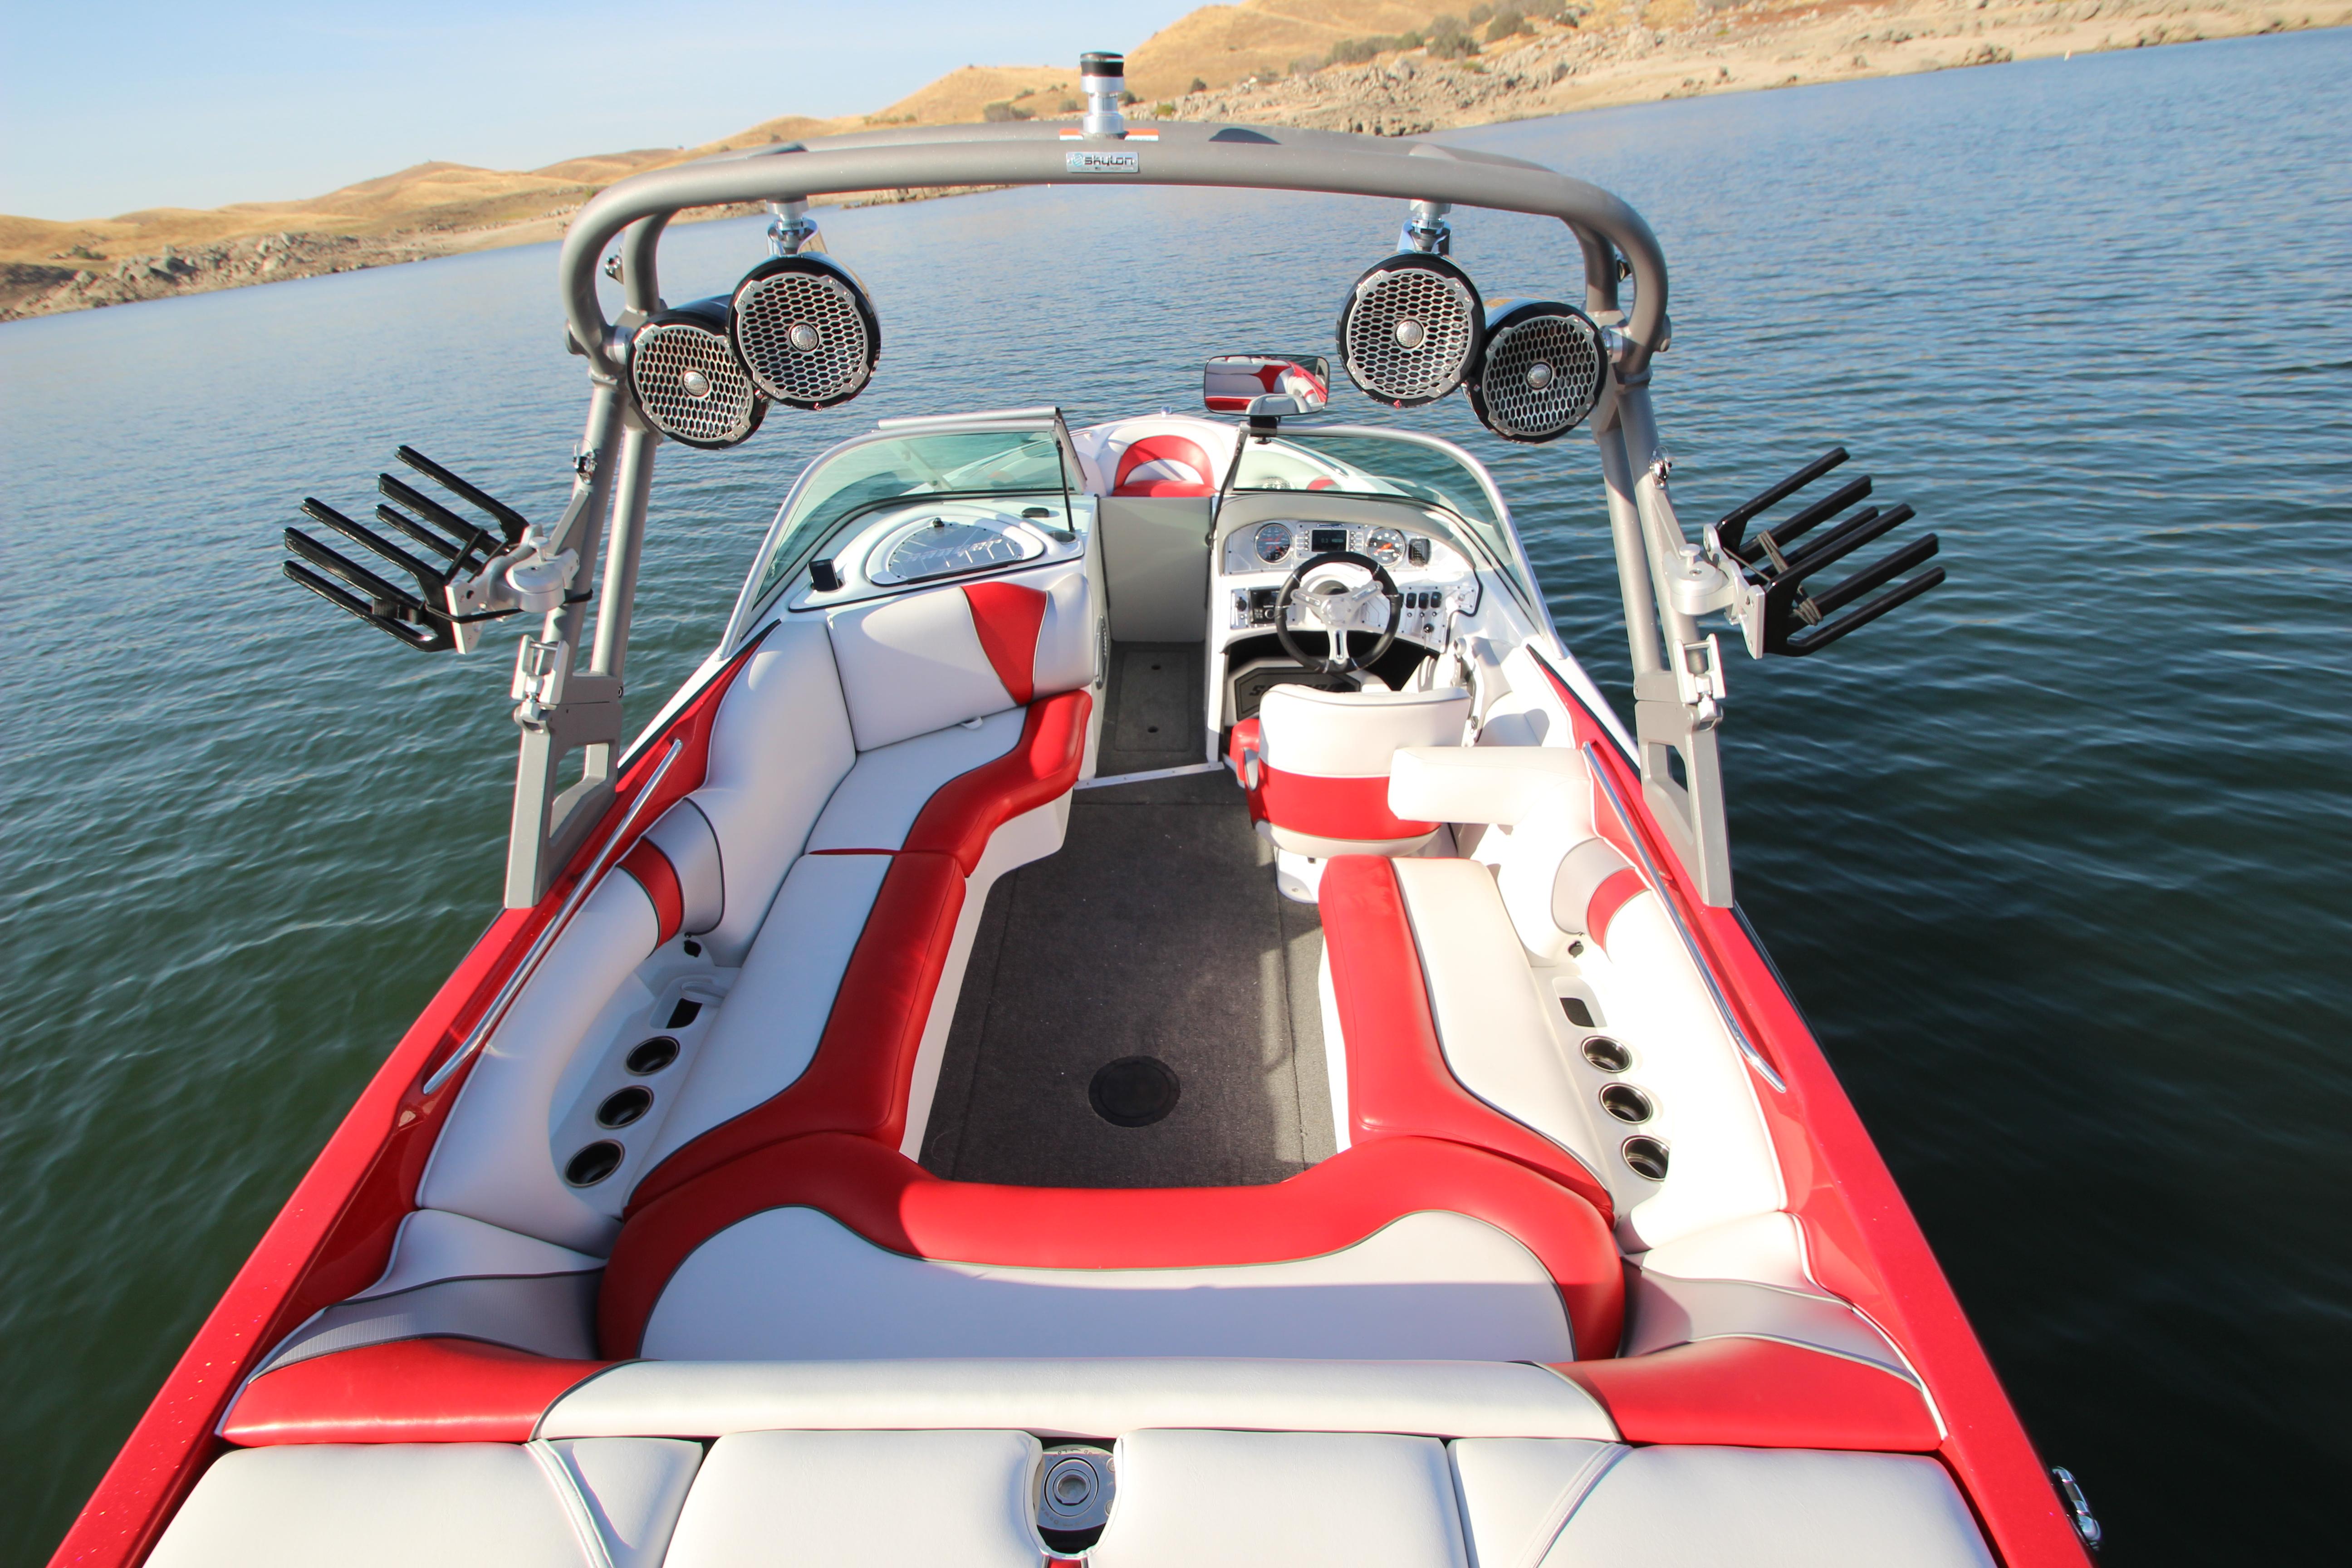 Sanger V215 Xtz Wakesurf Wakeboard Boats Sanger Boats